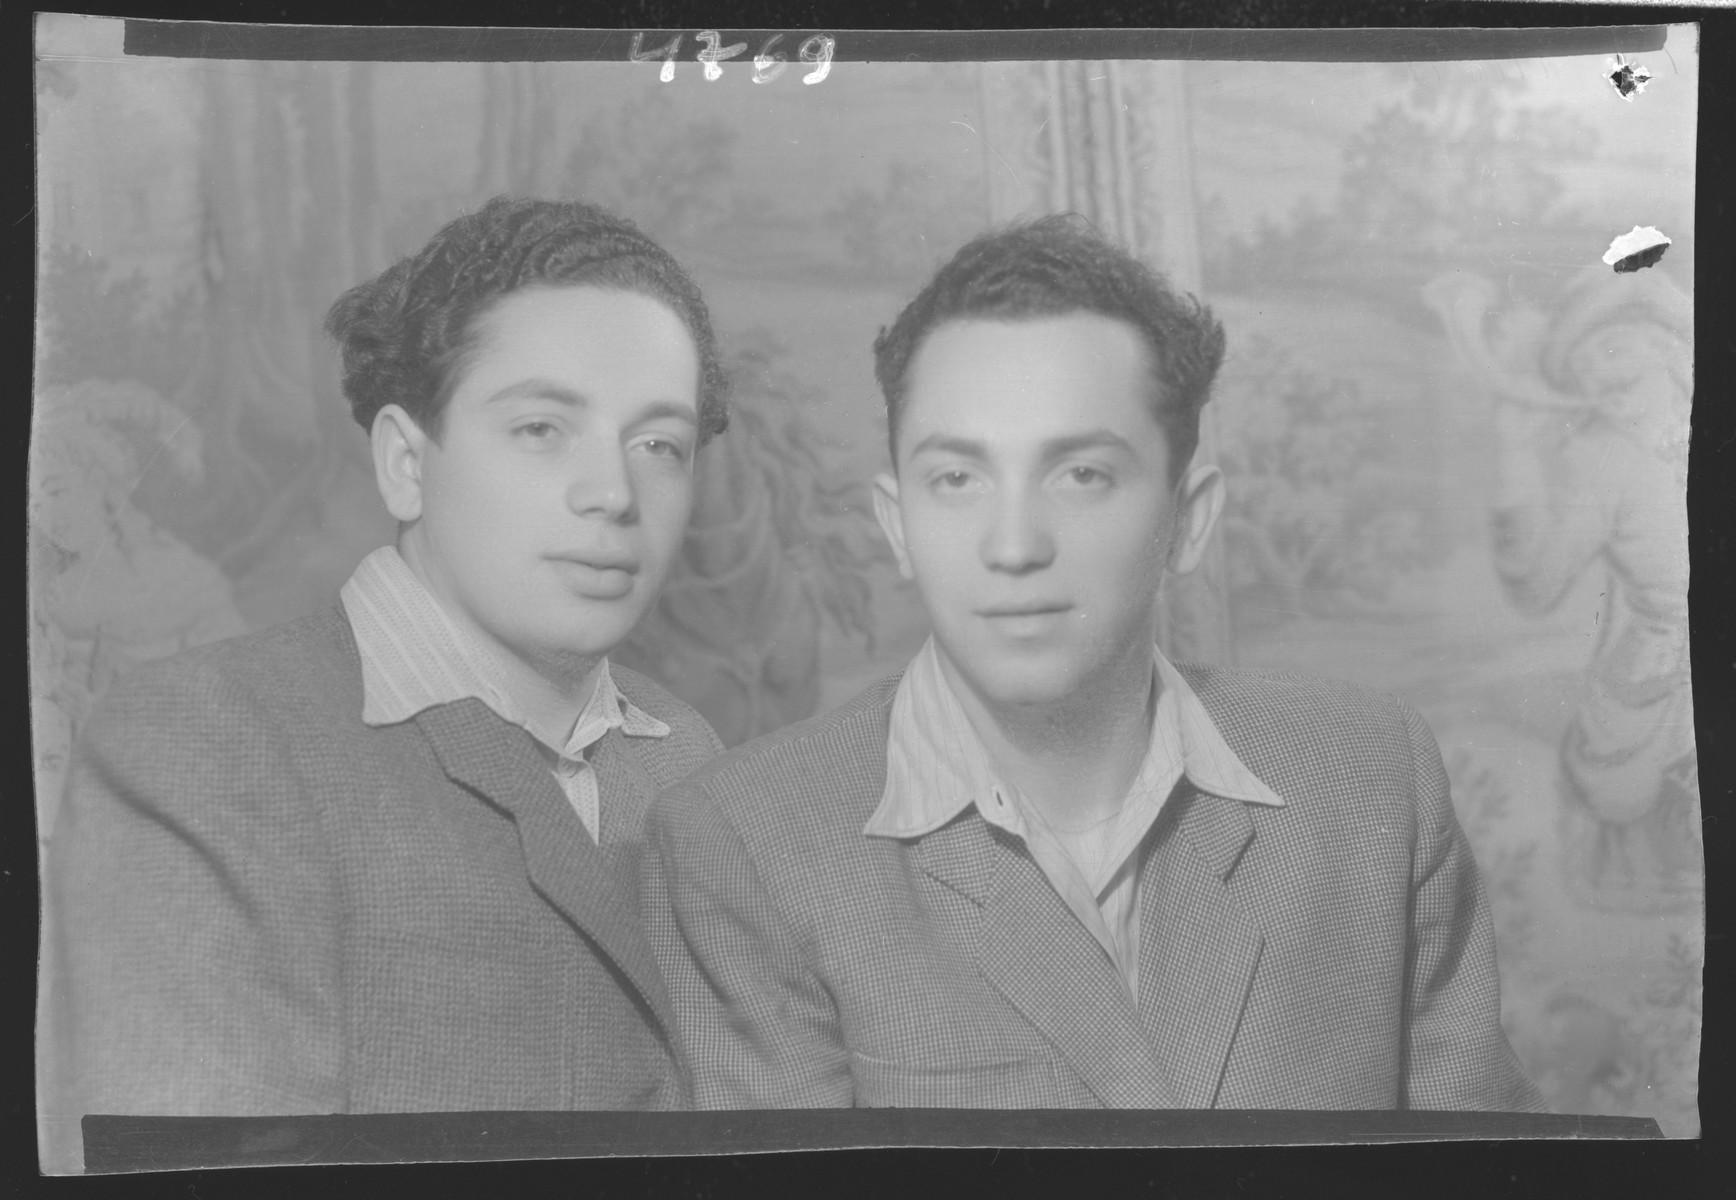 Studio portrait of Sandor Davidovits and [probably his brother].